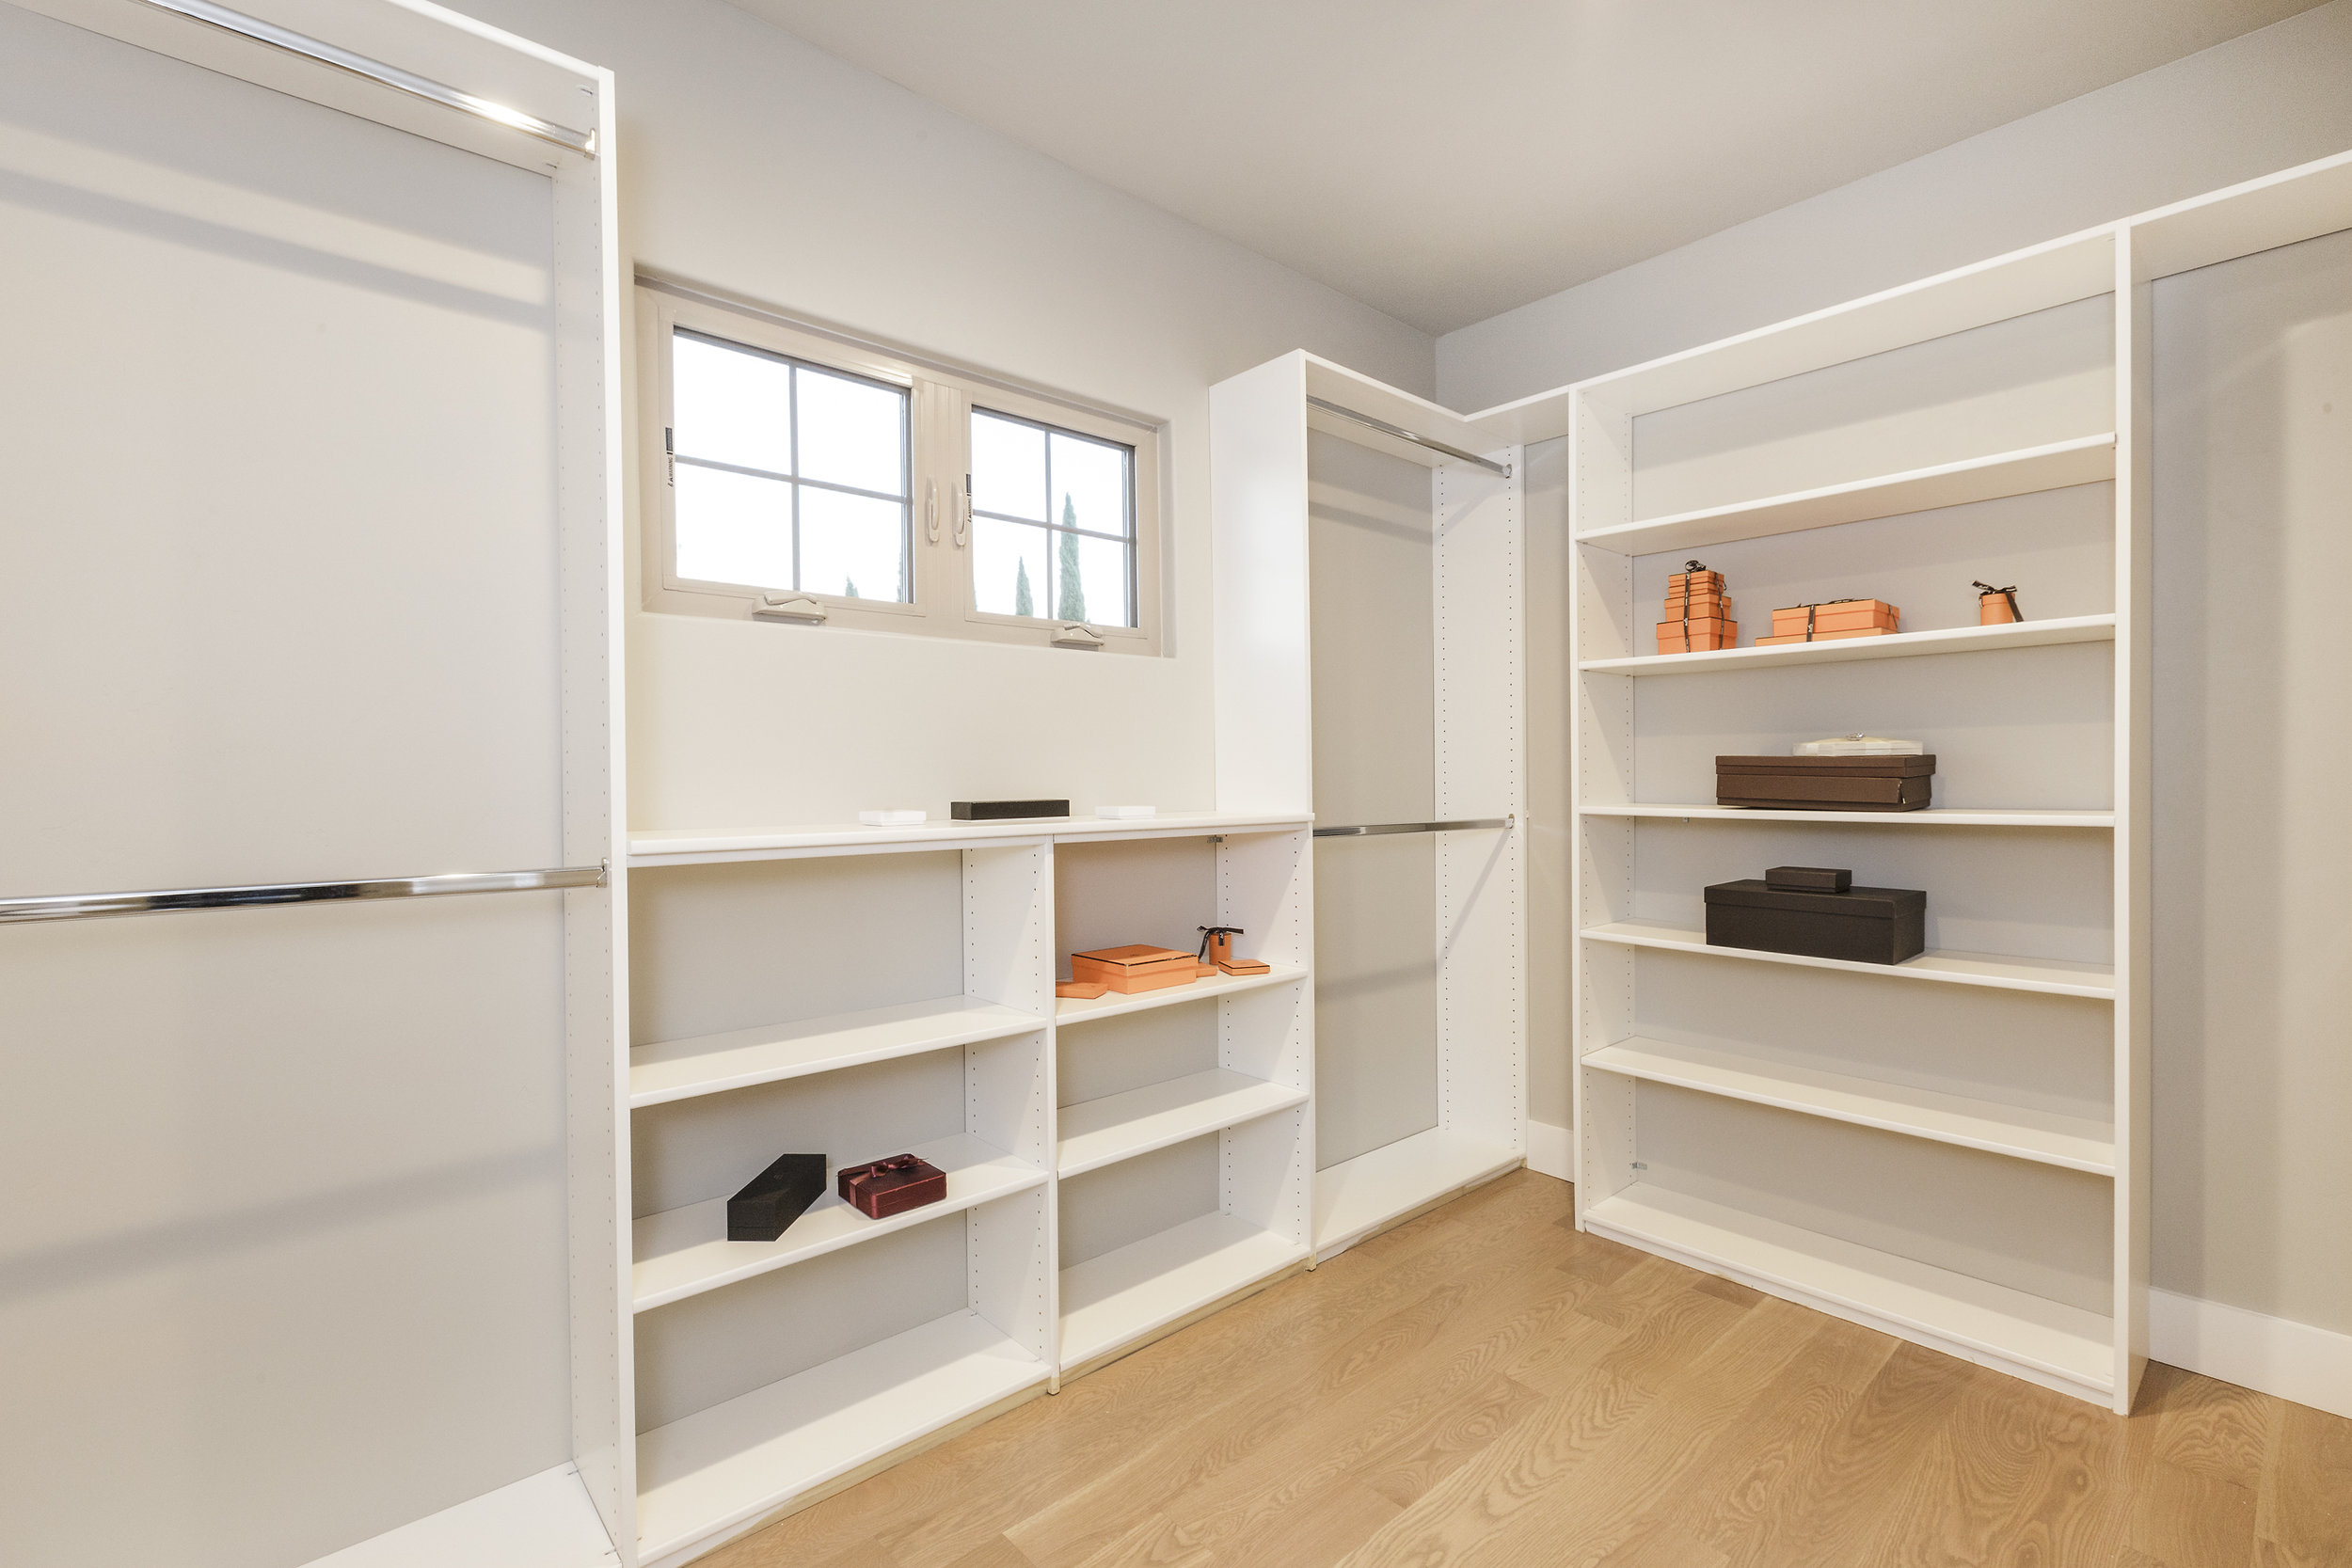 023-21825-Lomita-2bed-closet-high-res.jpg